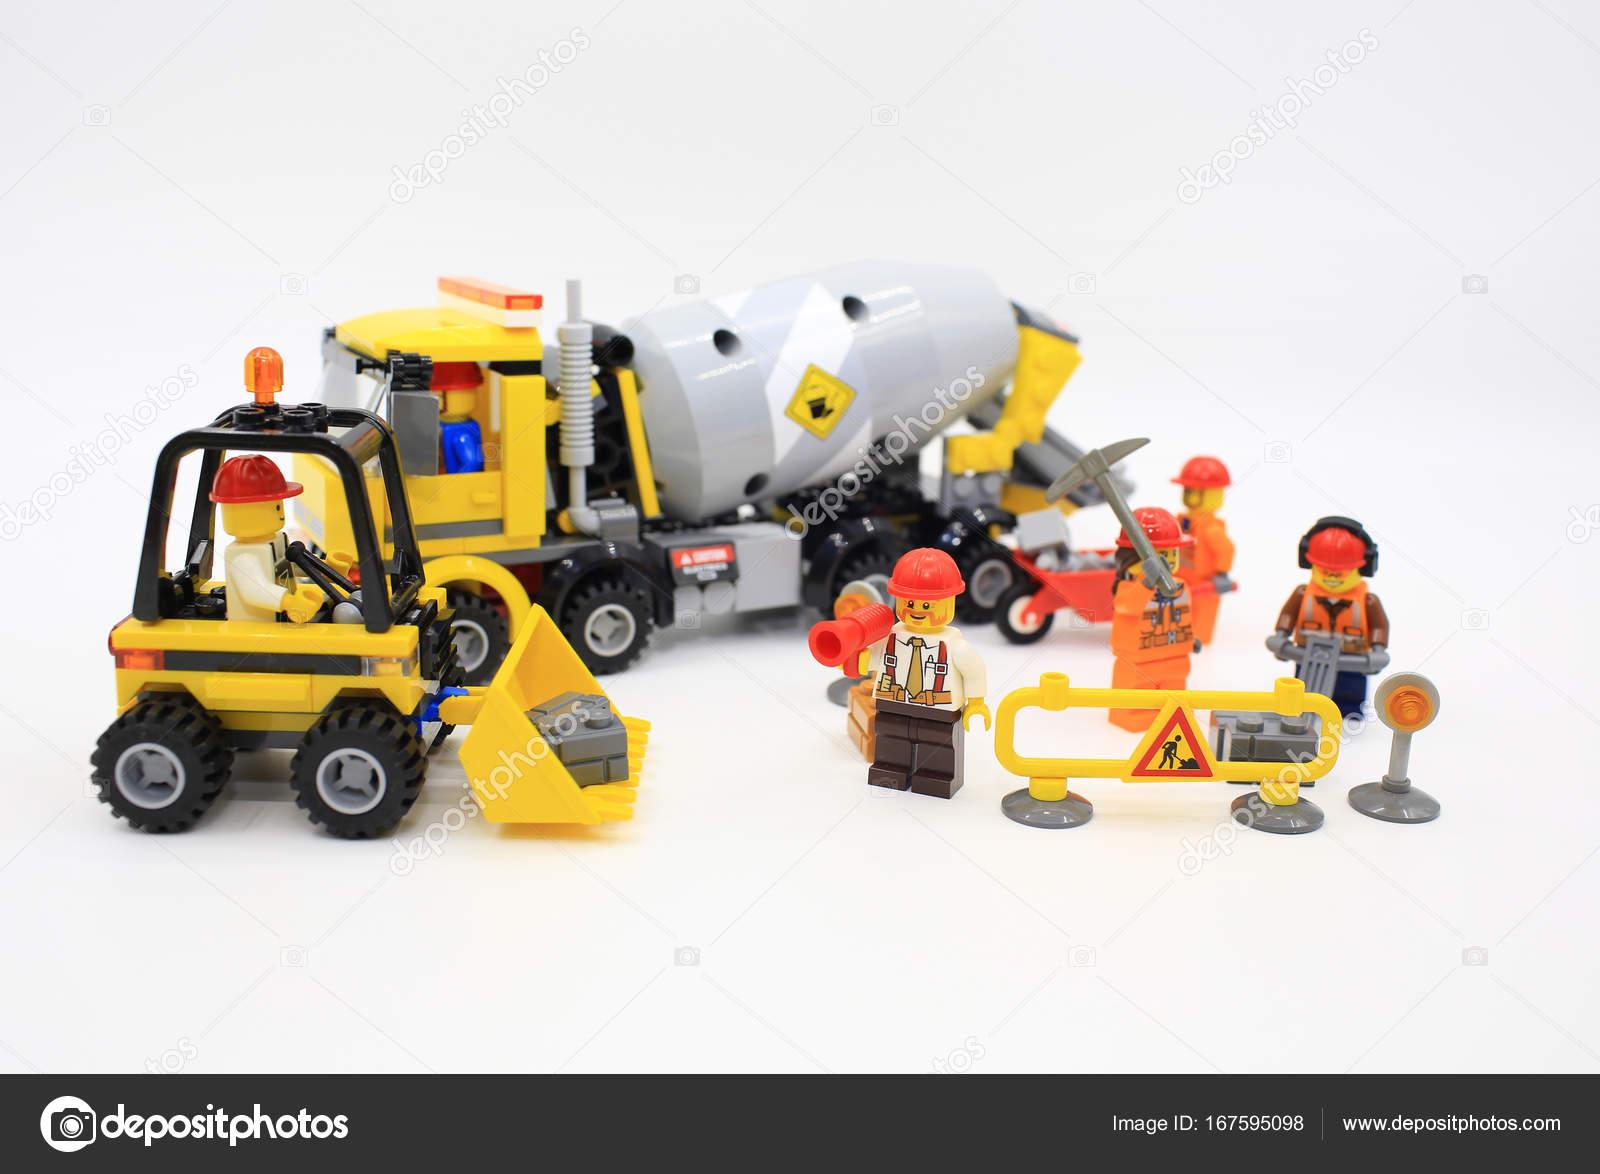 D'oeuvre D'oeuvre Lego Main Lego Main D'oeuvre Lego Main D'oeuvre Lego Main Main D'oeuvre Lego PuZkXi